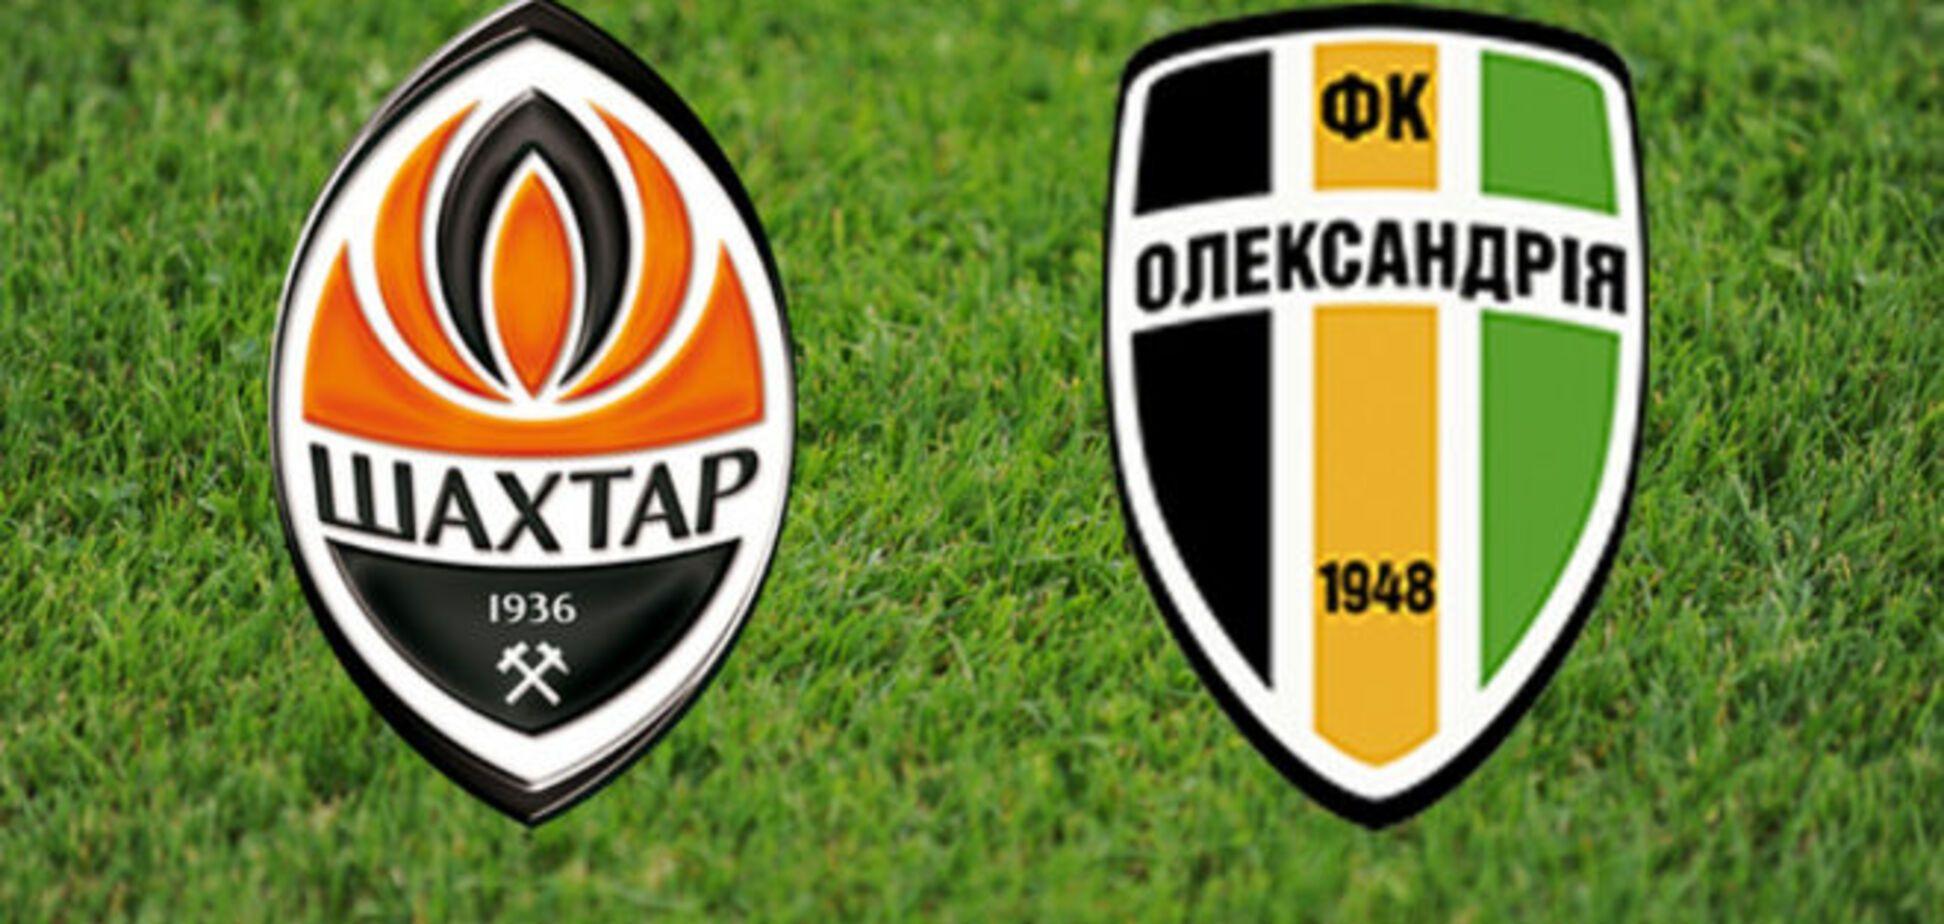 Шахтер - Александрия - 2-0: смотреть видео матча